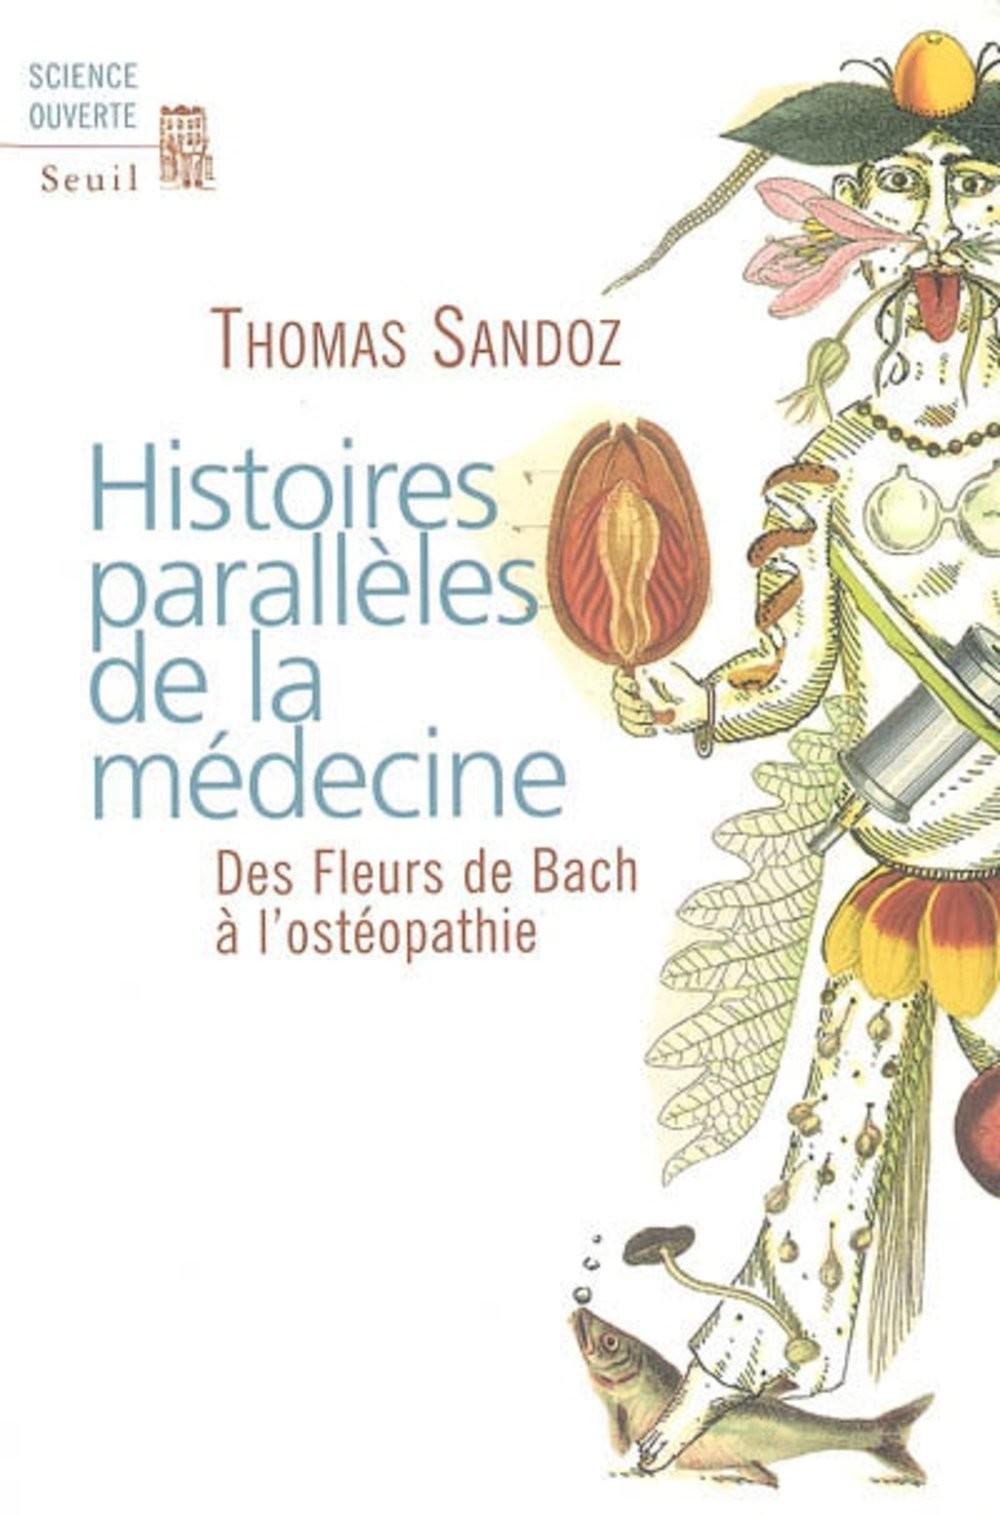 Histoires parallèles de la médecine de Thomas Sandoz